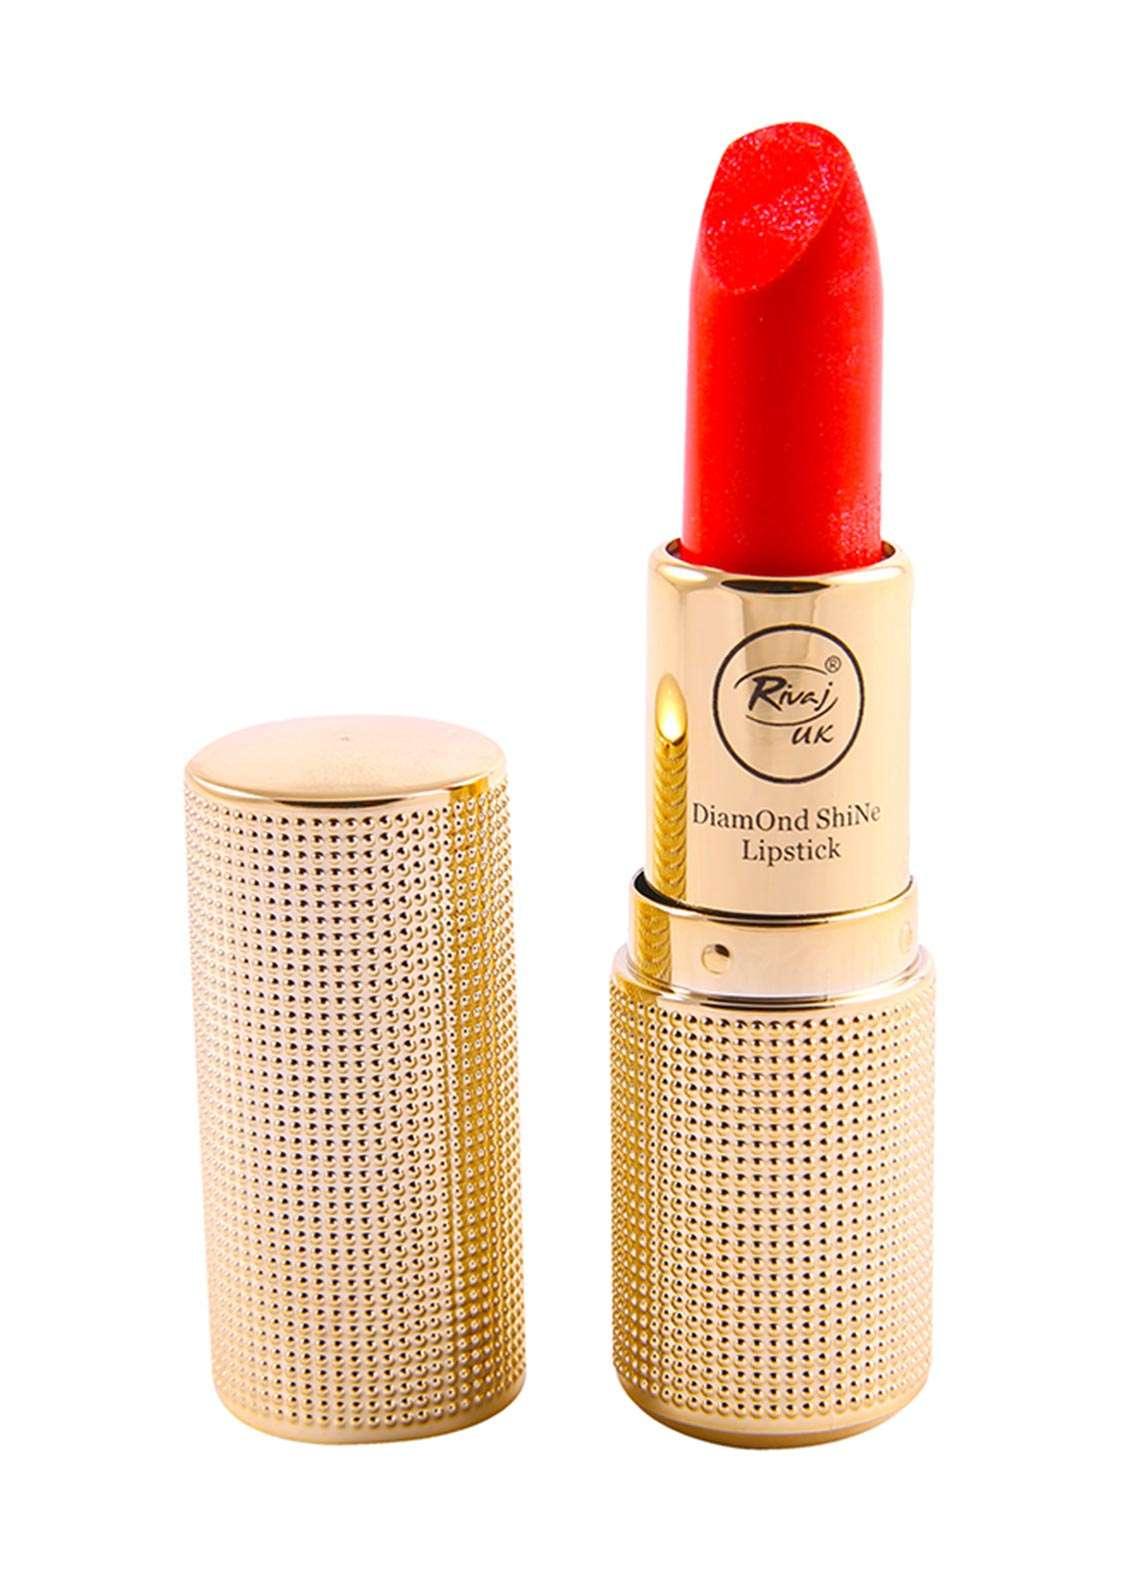 Rivaj UK Diamond Shine Lipstick - 18